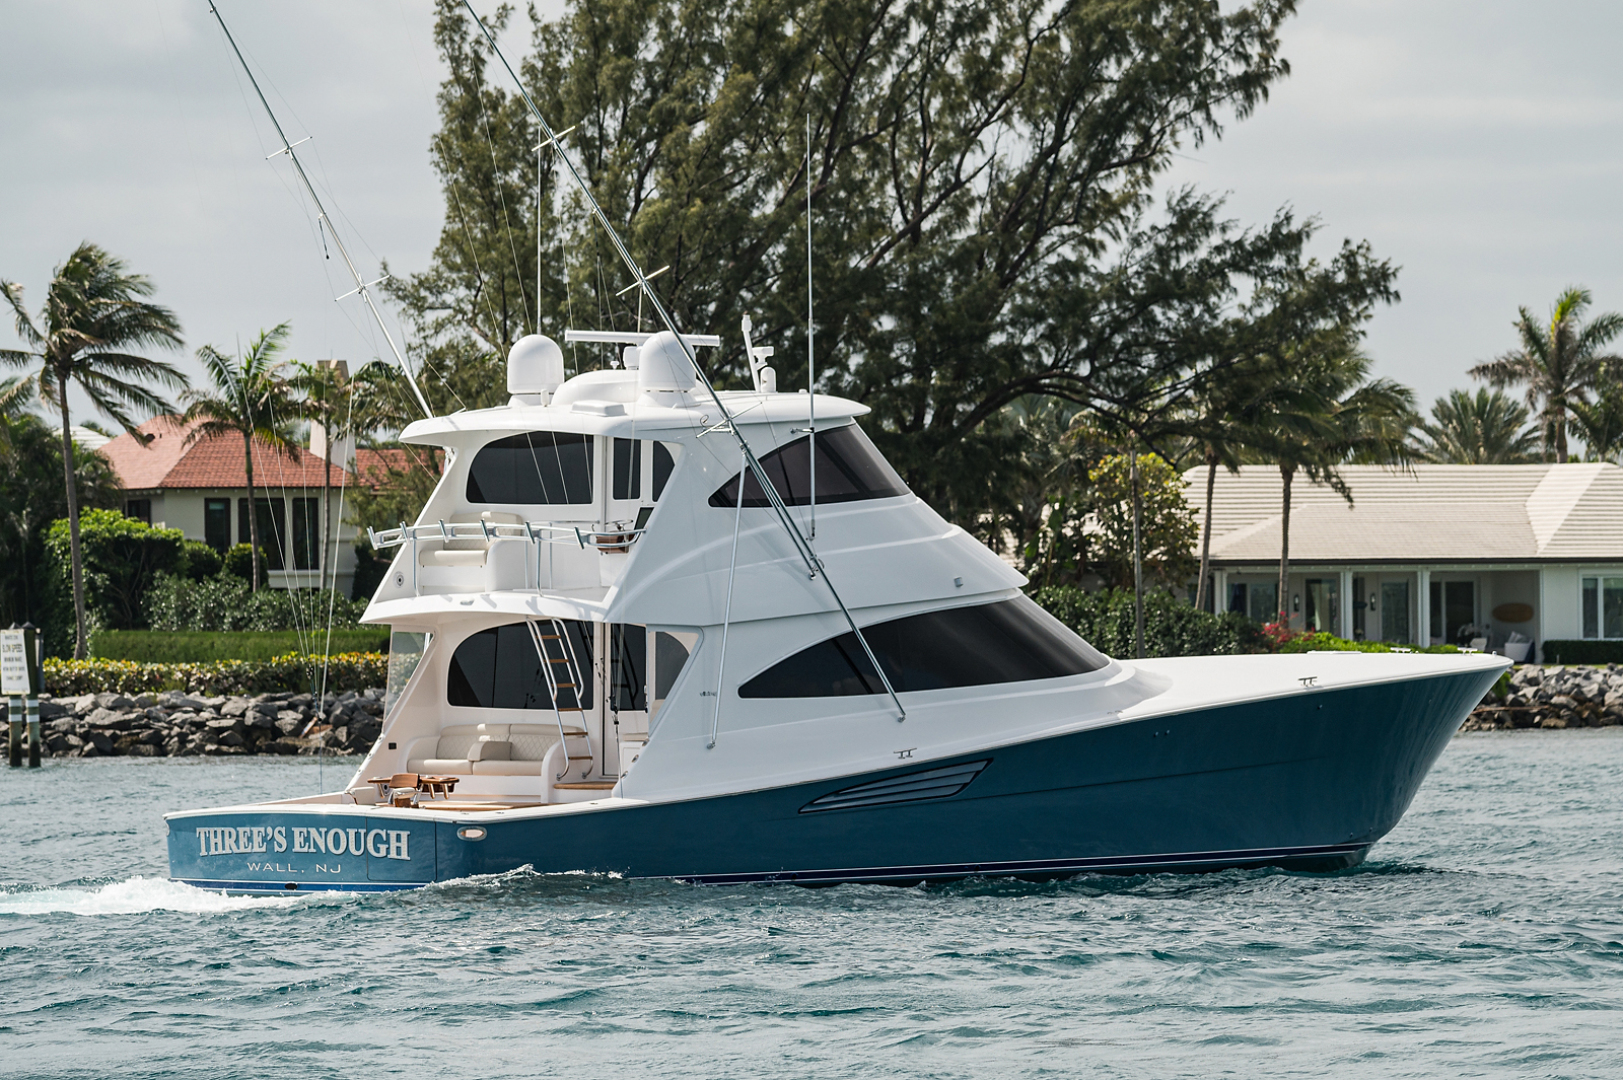 Viking 72 - Three's Enough - Exterior Profile